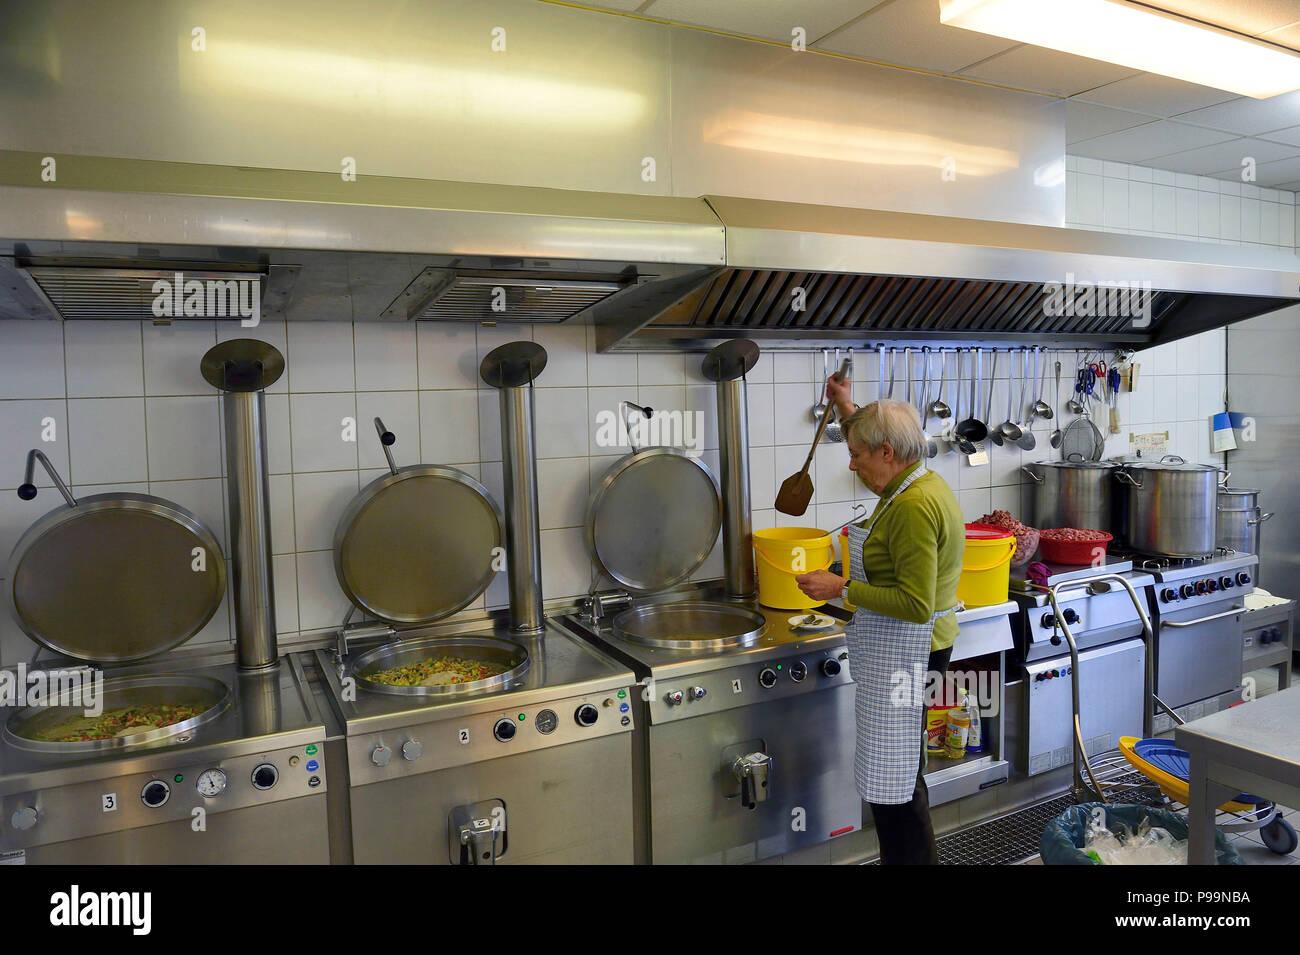 Volunteer Soup Kitchen Stockfotos & Volunteer Soup Kitchen Bilder ...